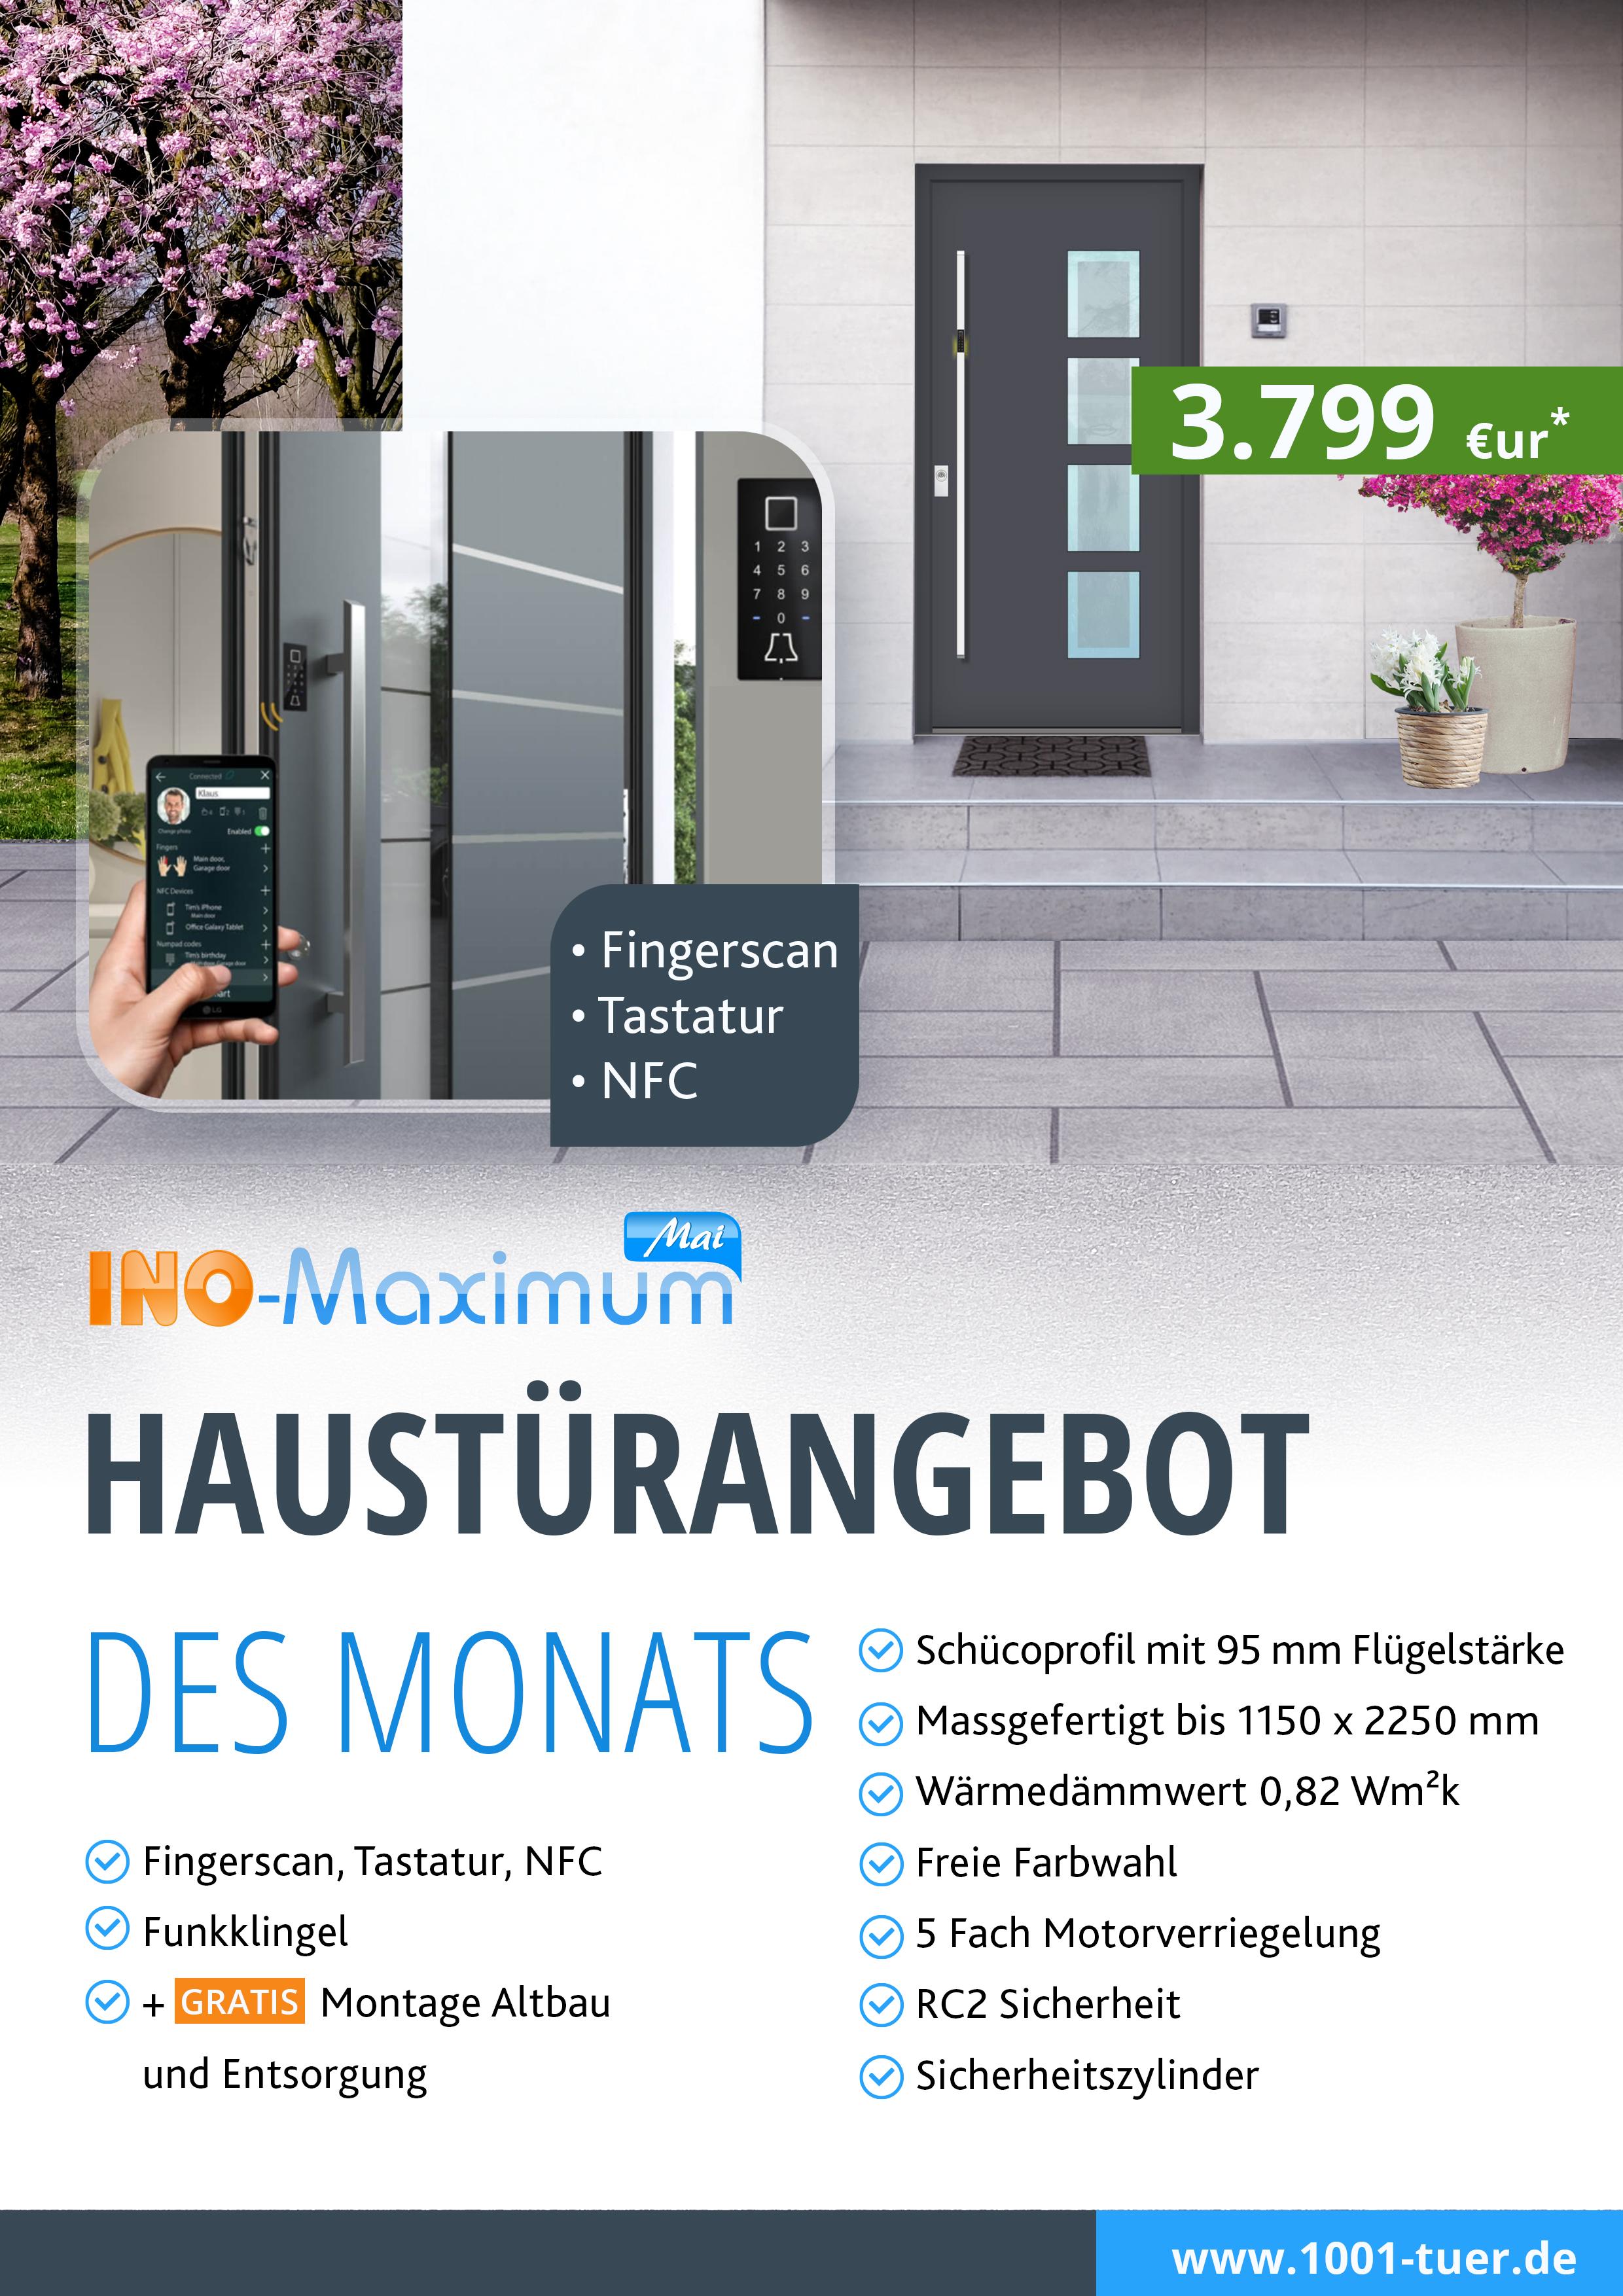 Flyer-A4-fuehjahr-mai-hochkant